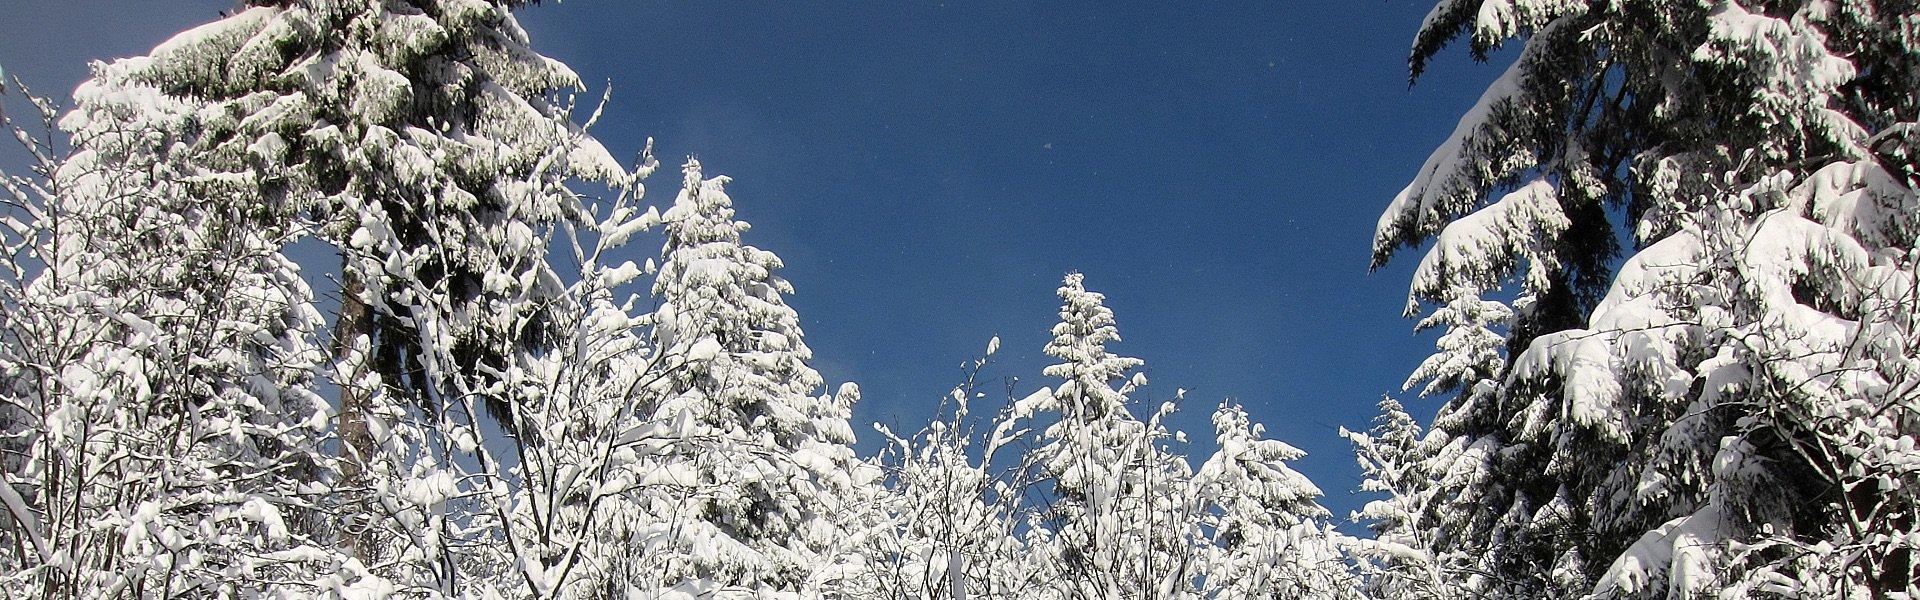 Winterlandschaft Oberwiesenthal